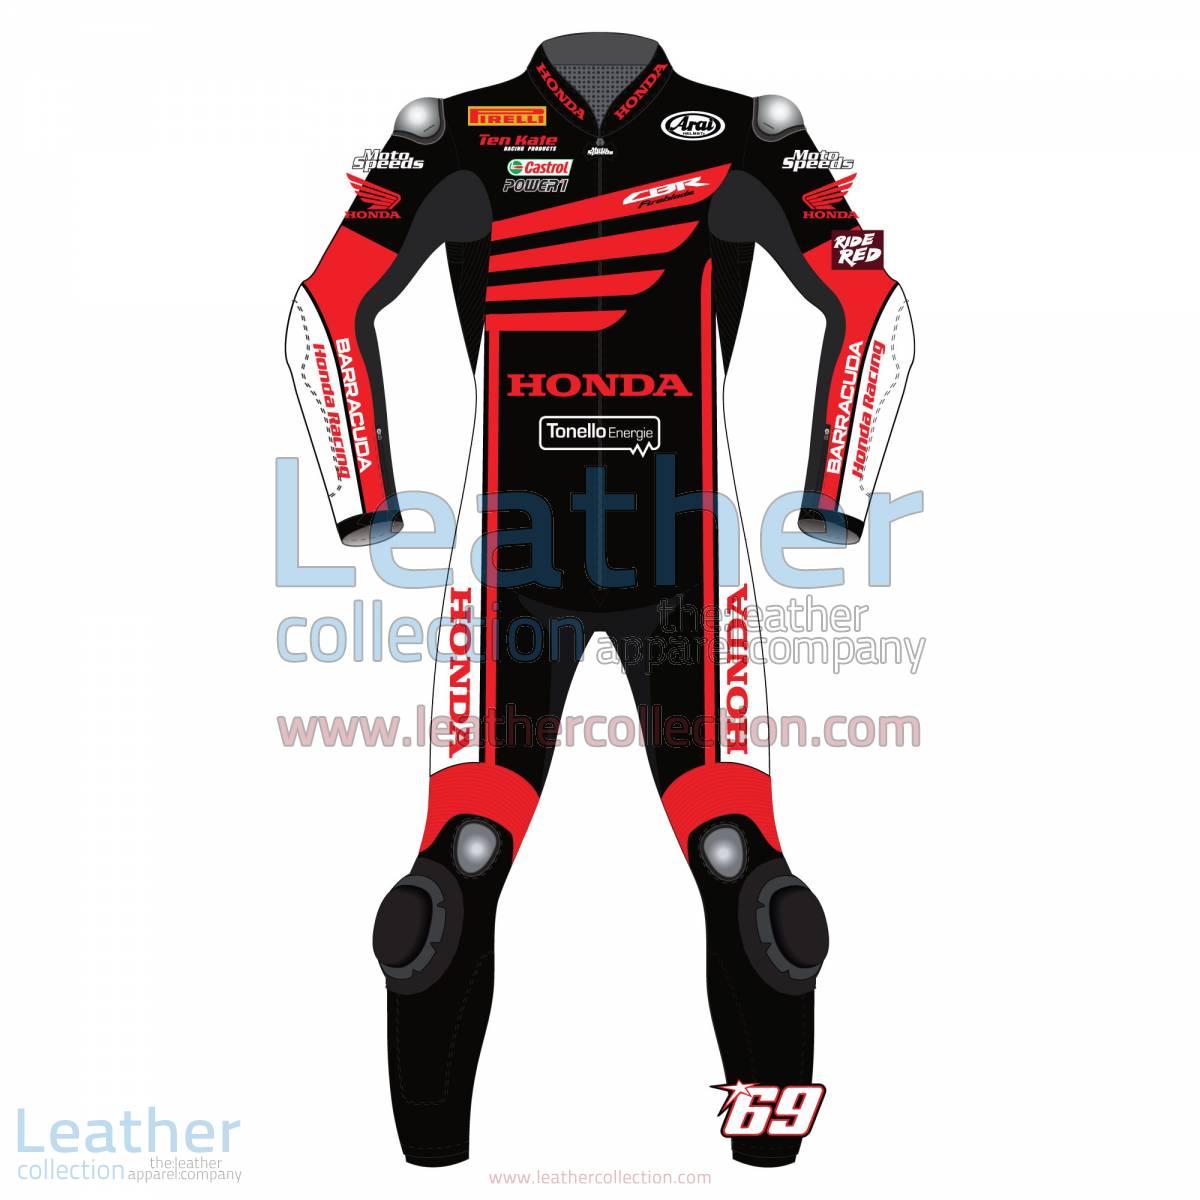 Nicky Hayden WSBK Winter Test Honda 2015 Motorcycle Suit | Nicky Hayden Honda,Nicky Hayden WSBK Winter Test Honda 2015 Motorcycle Suit